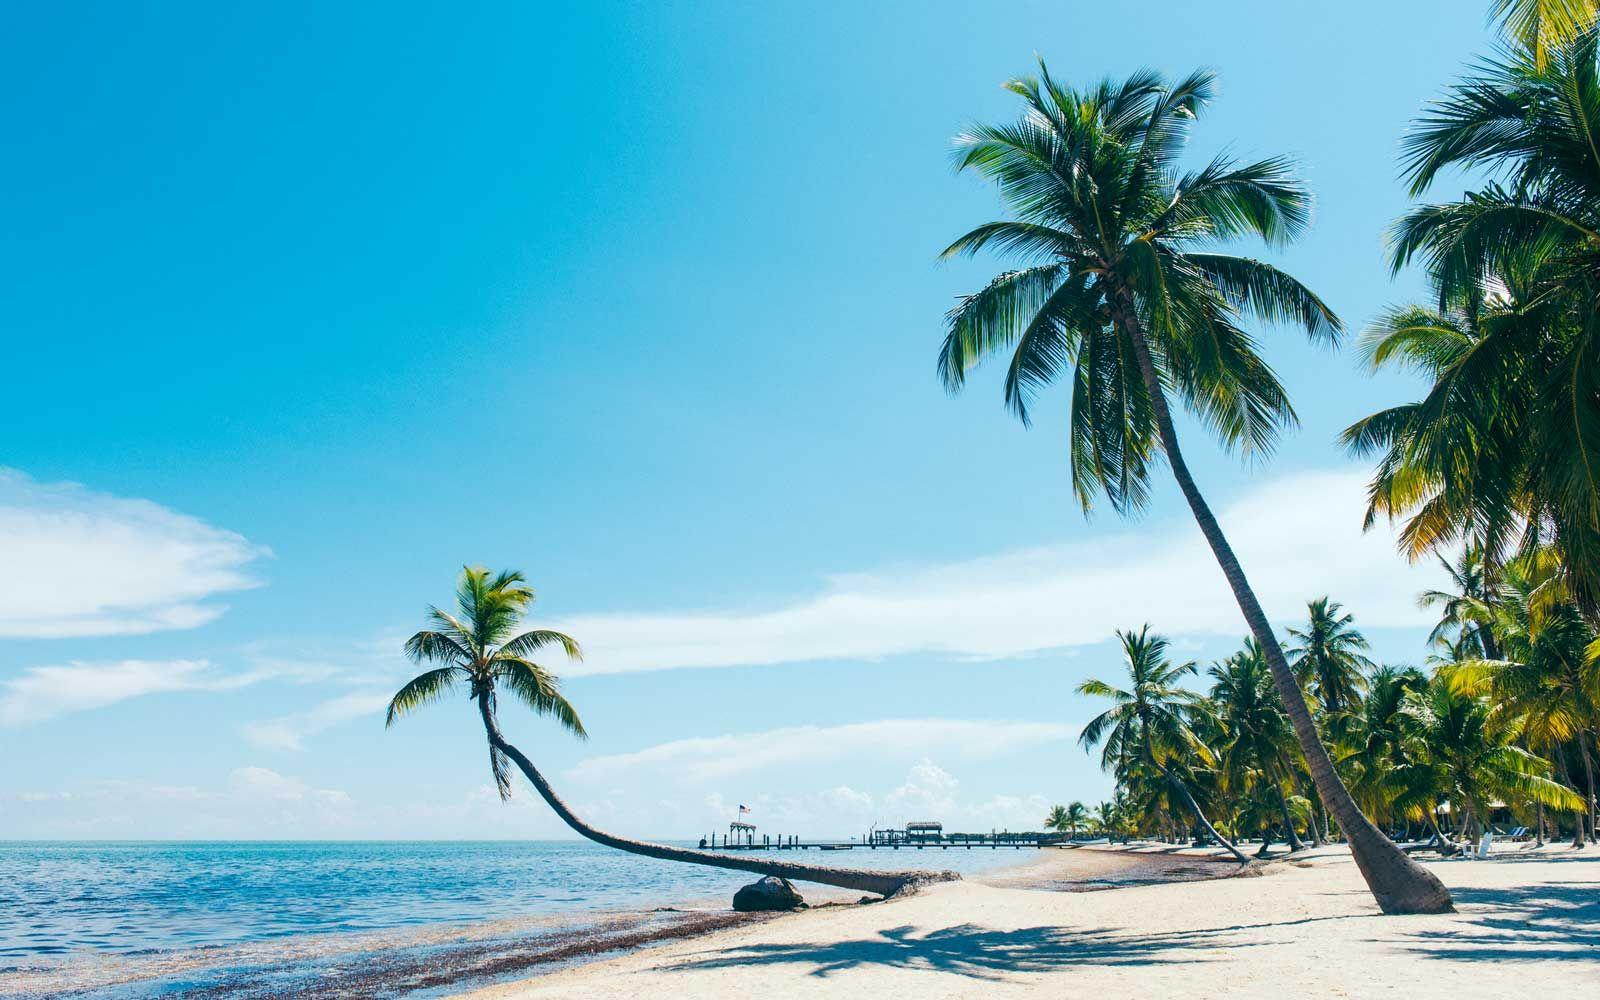 Florida S Best Vacation Destinations Cool Places To Visit Best Vacation Destinations Florida Attractions